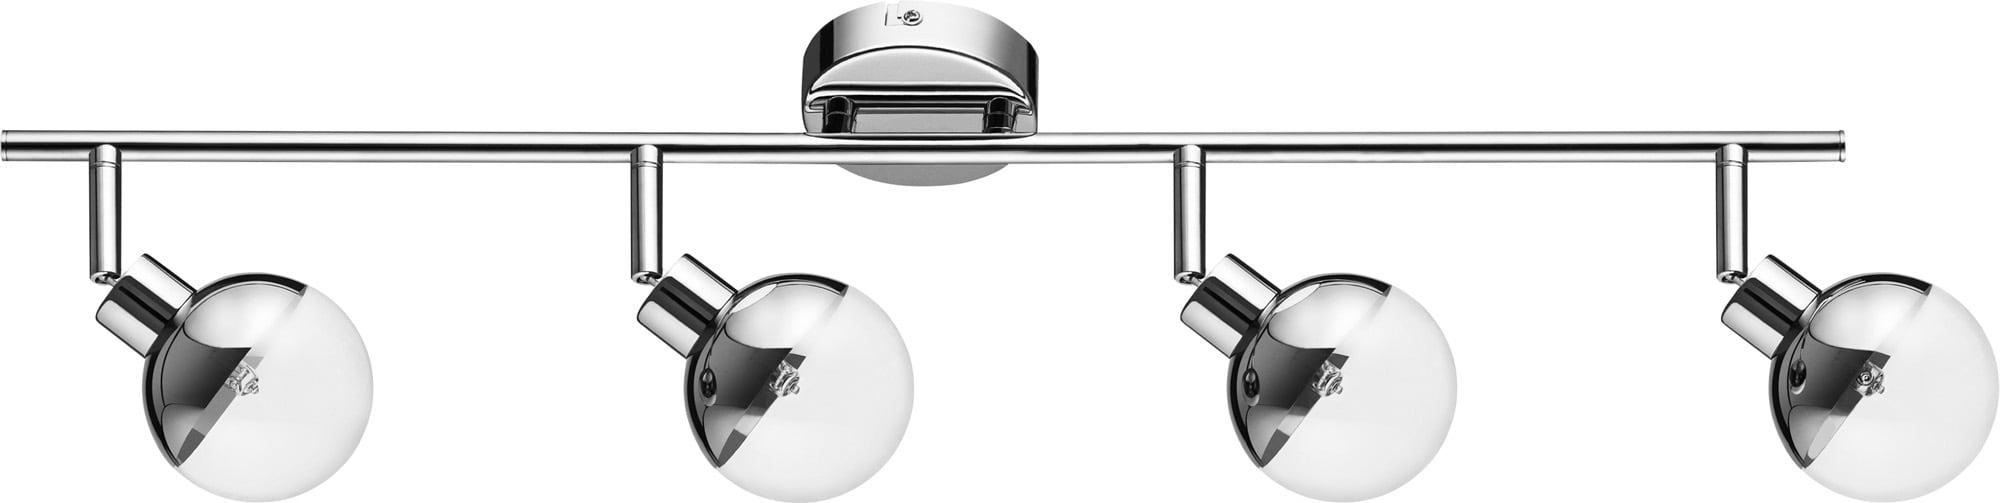 Modern Chrome Plafon - Ginos 4-spot G9 28W reflector